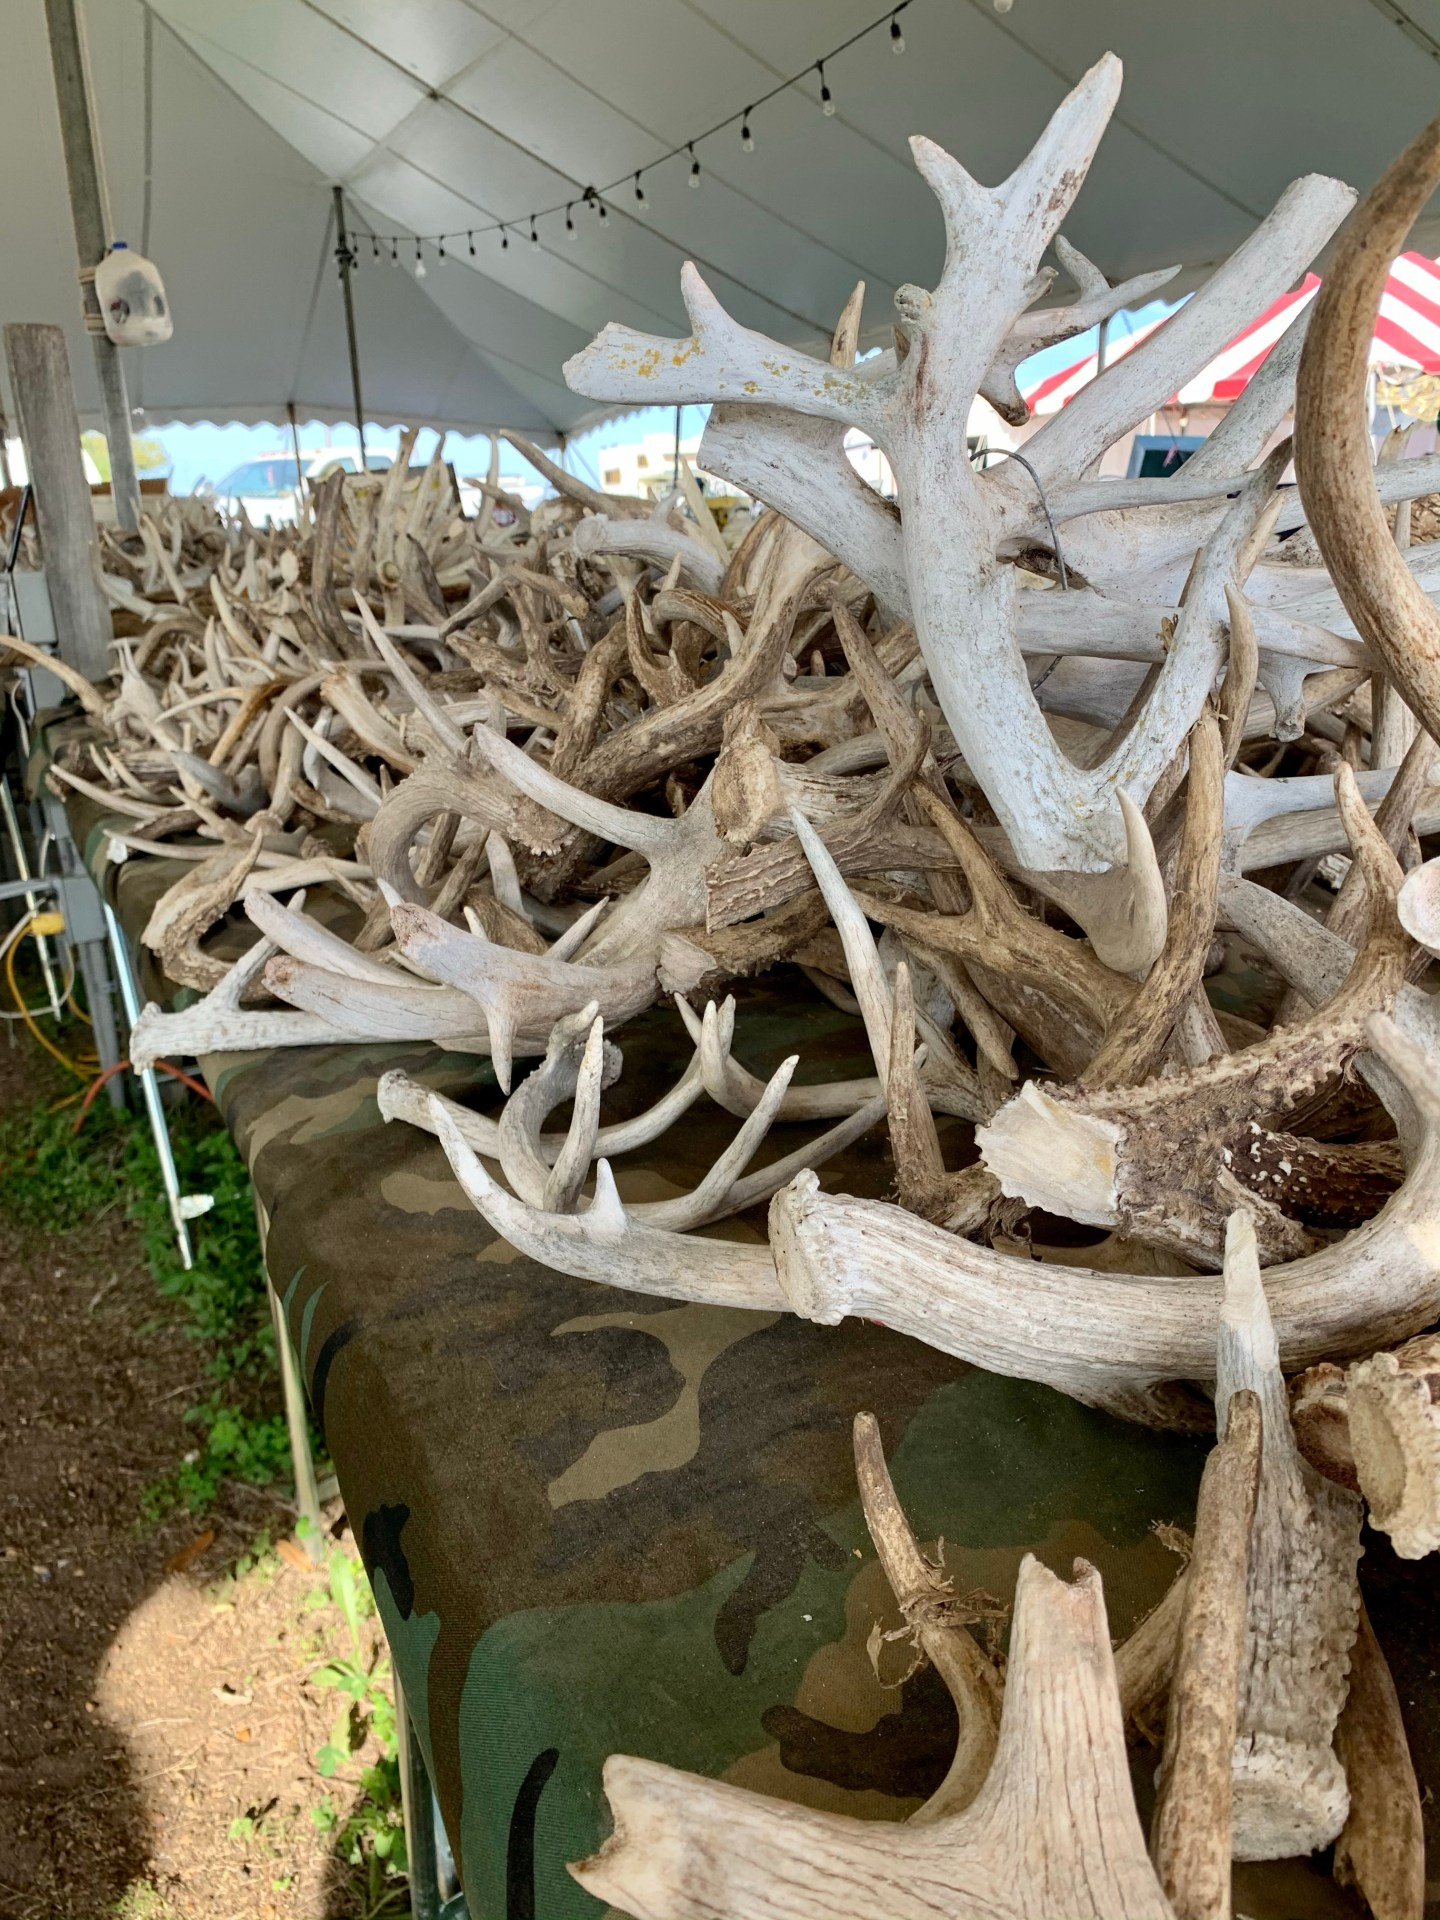 This flea market vendor sells nothing but antler sheds and flint.